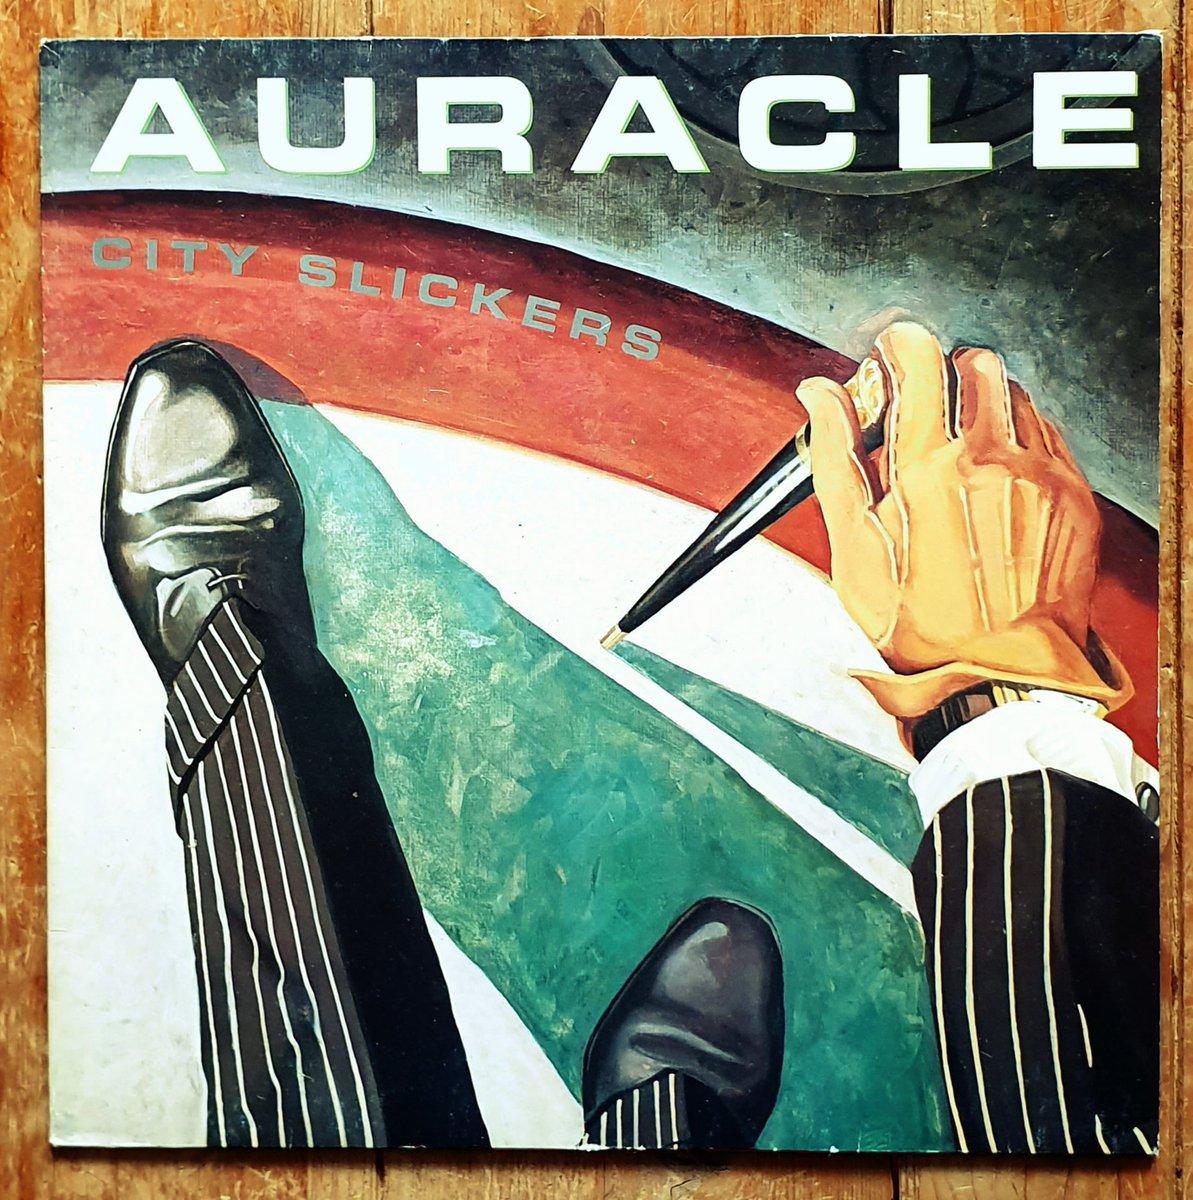 #Auracle  – #CitySlickers Label: #ChrysalisRecords – 6307 653 Format: Vinyl, #LP, Album Country: Germany Released: #1979s Genre: #JazzFunk Style: #JazzRock #Jazzfusion   #BombsAwayBallet #CityOfPenetratingLight #Sambanana #instarecords  #vinylrecordcollection #instavinyl pic.twitter.com/QeBOCMtsi8